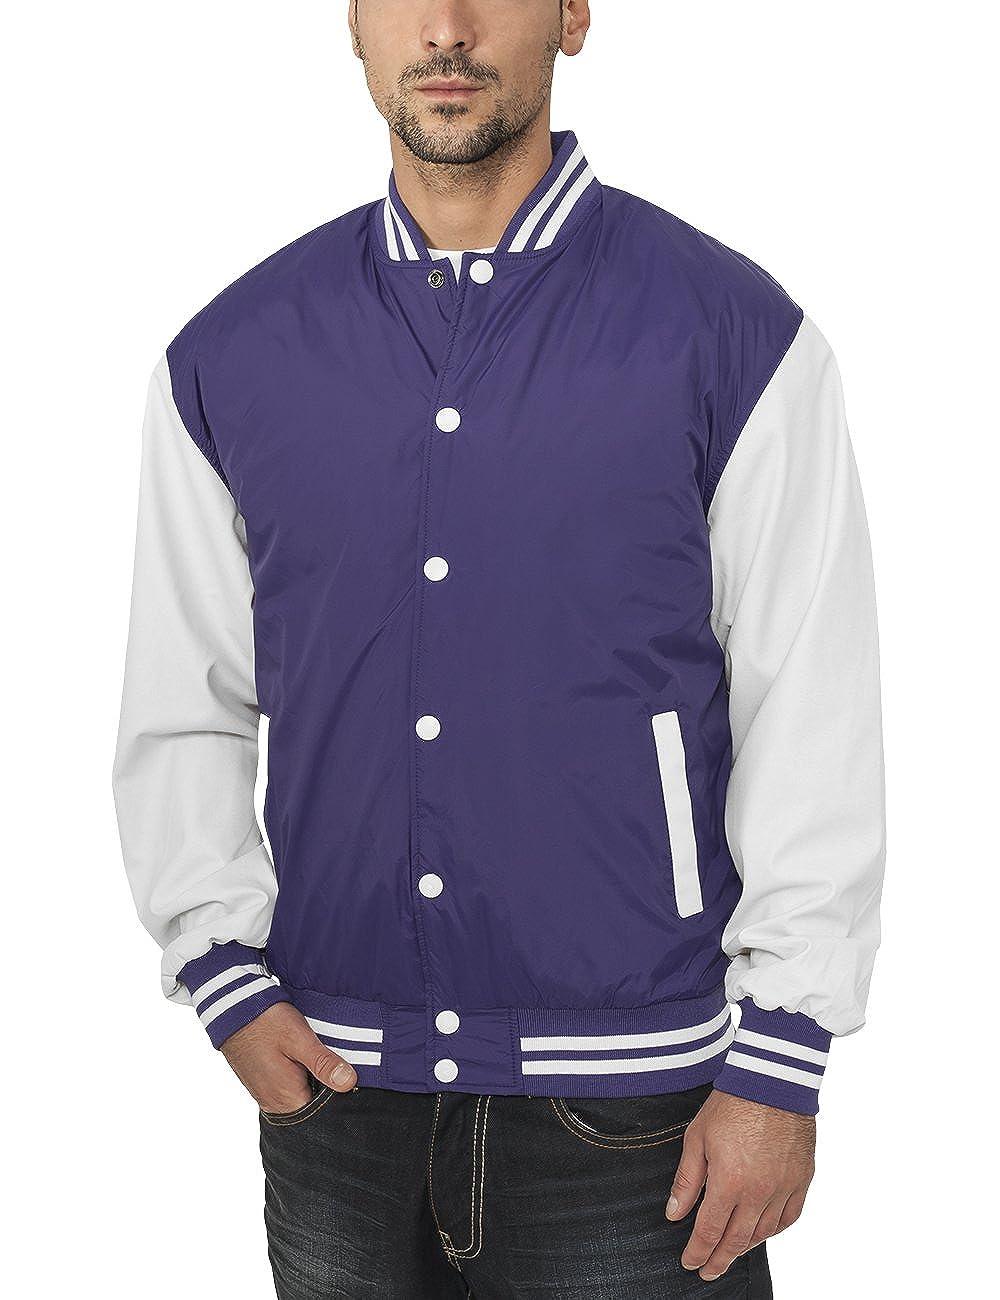 Urban Classics Jacke Light Jacket - Chaqueta Hombre, Multicolor (Purpur/White), X-Large (Talla del Fabricante: X-Large): Amazon.es: Ropa y accesorios